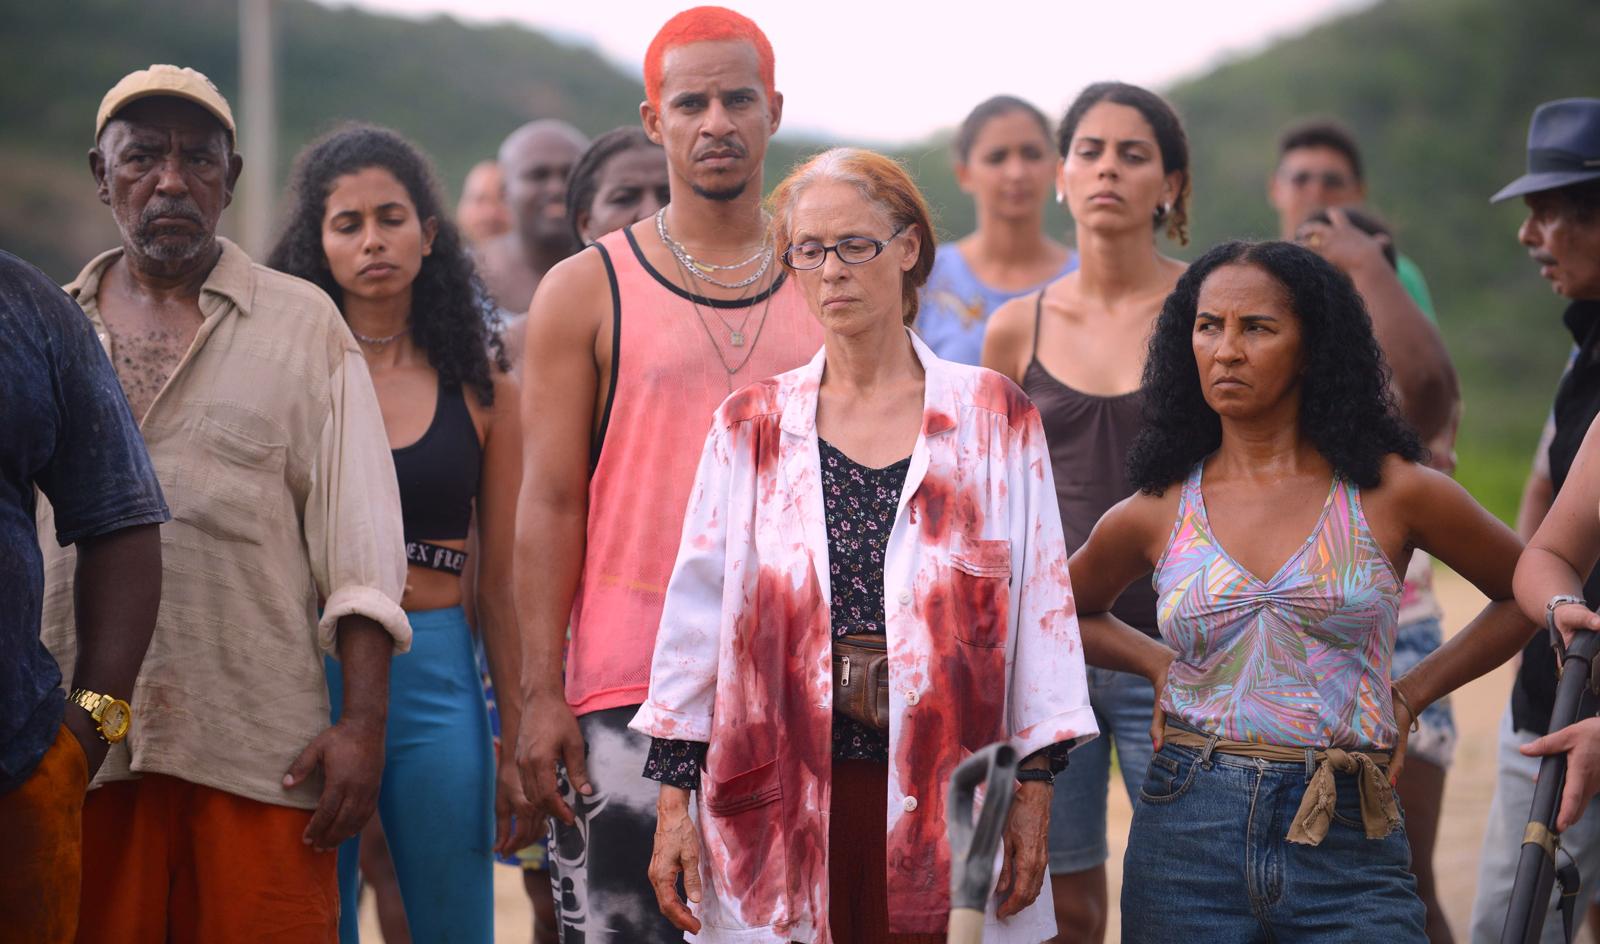 Bacurau Photo Sônia Braga critique avis cannes 2019